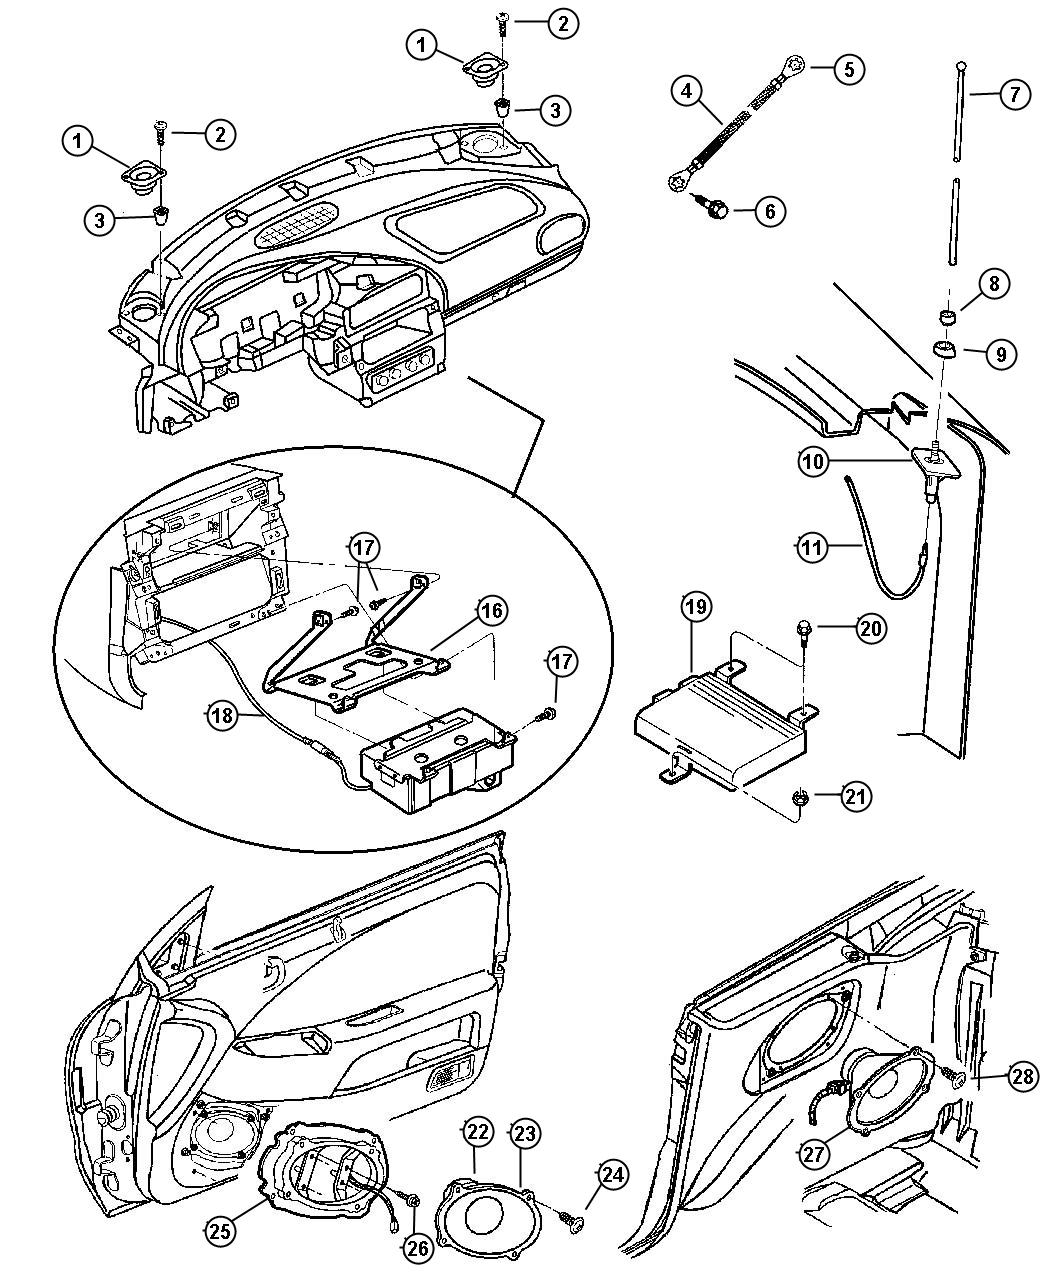 Chrysler Sebring Amplifier Radio Audio System